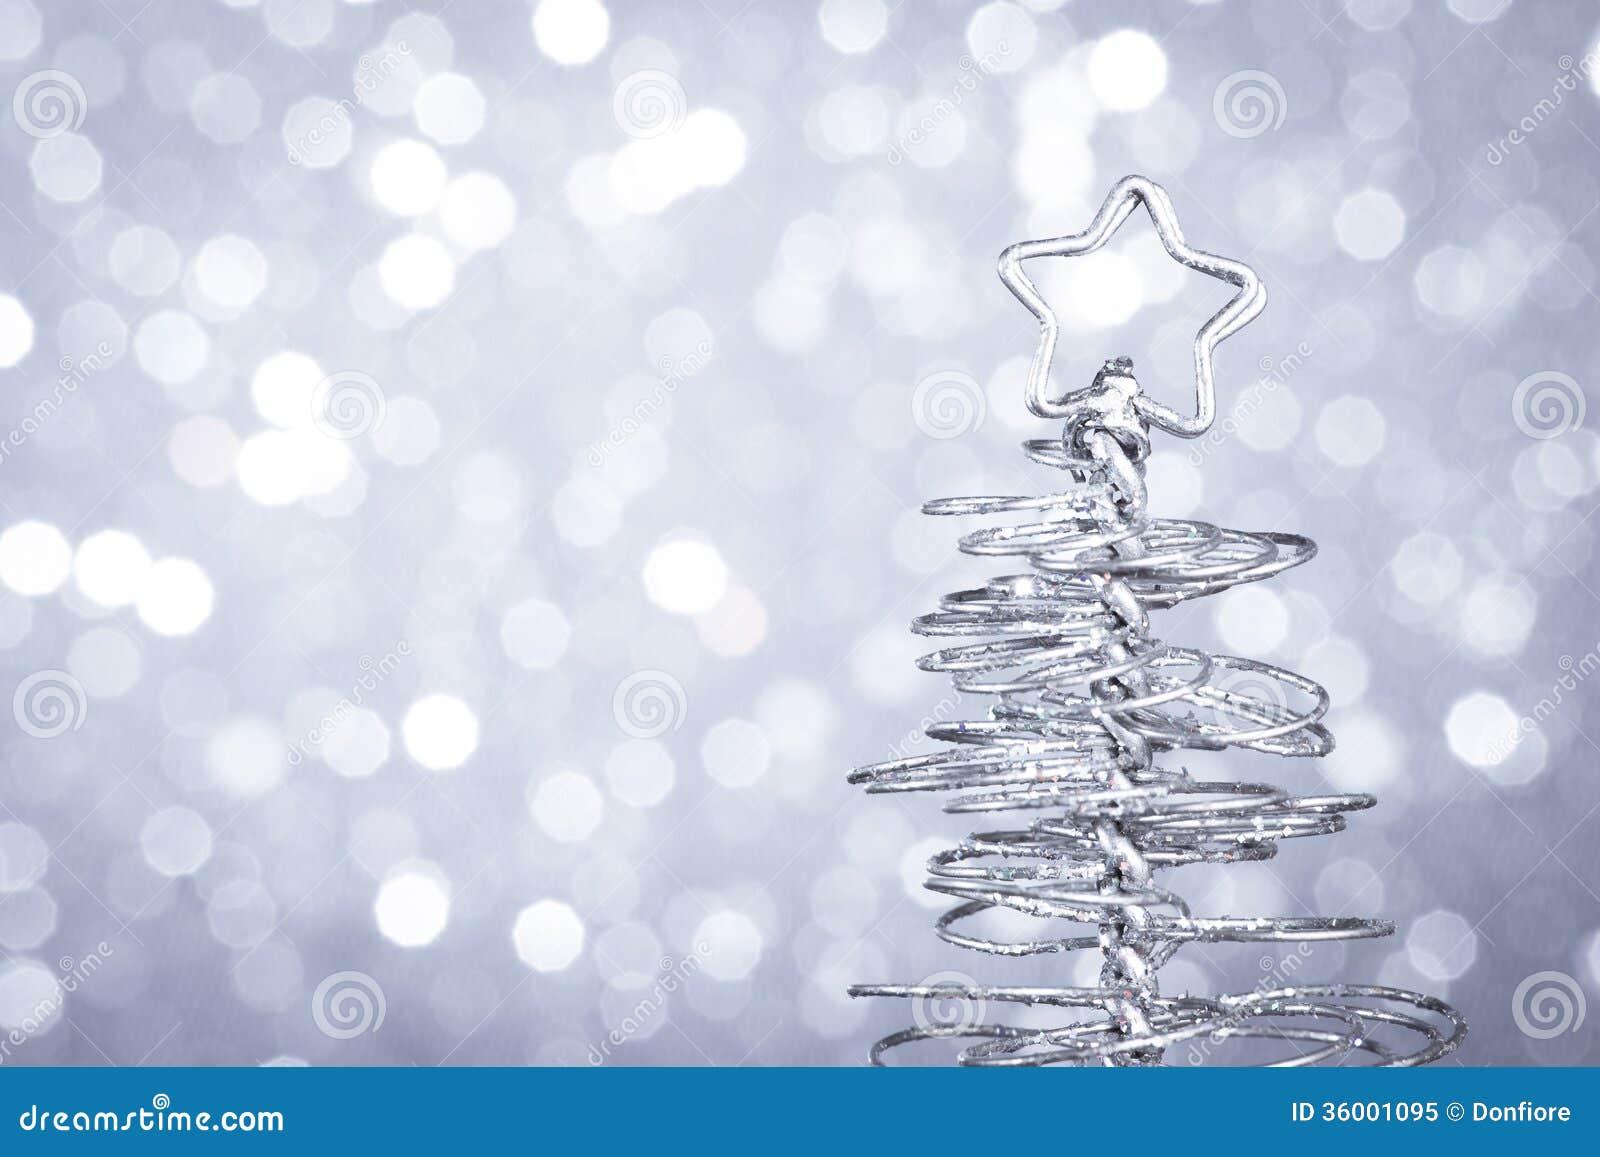 detail of metallic modern christmas tree on wood table